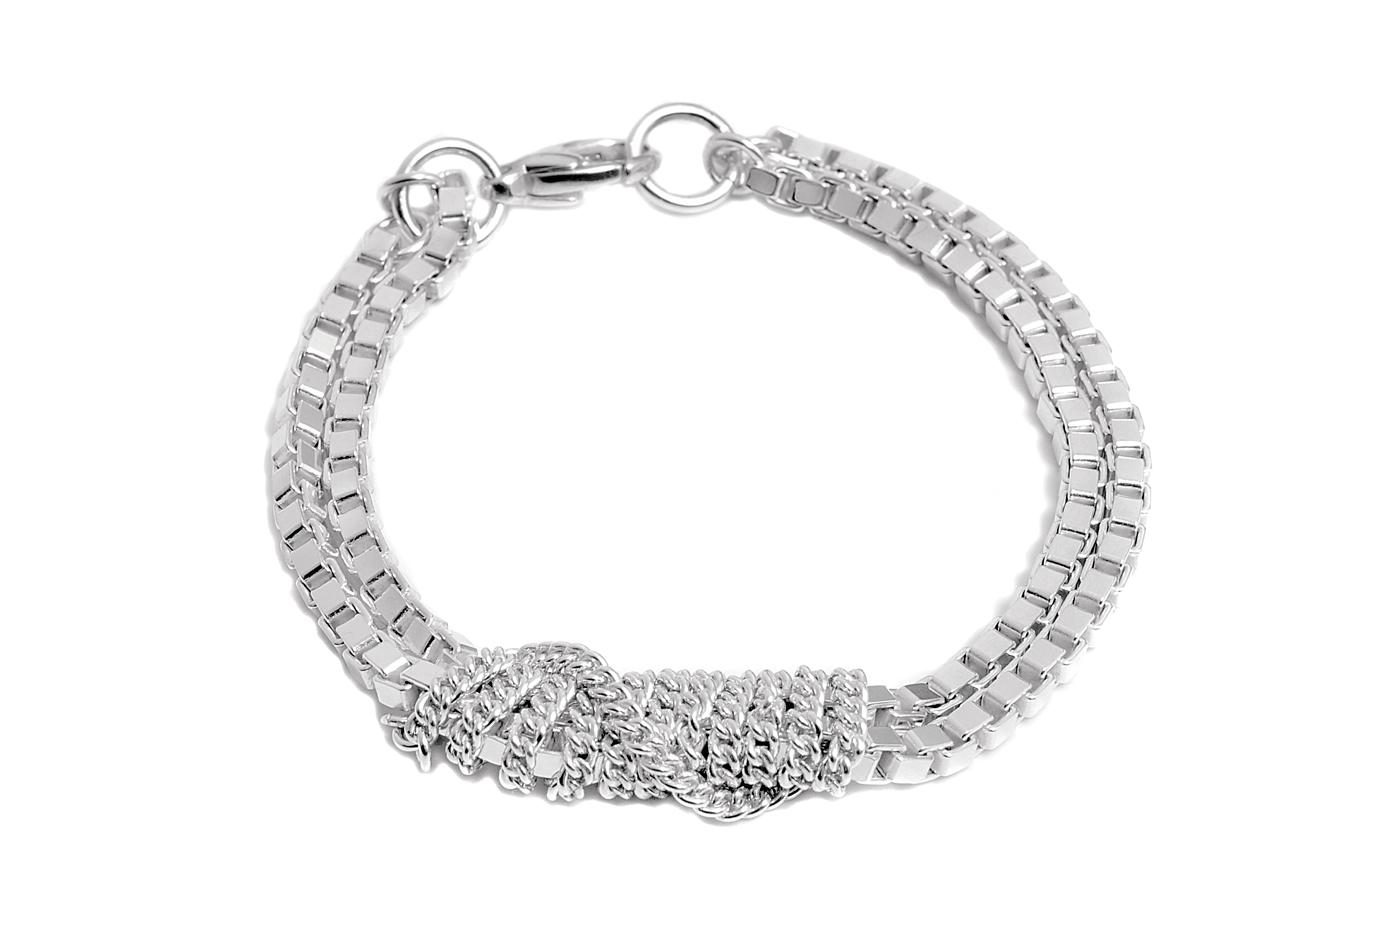 Adeline Cacheux Jewelry Design Bracelet Chaîne Argent